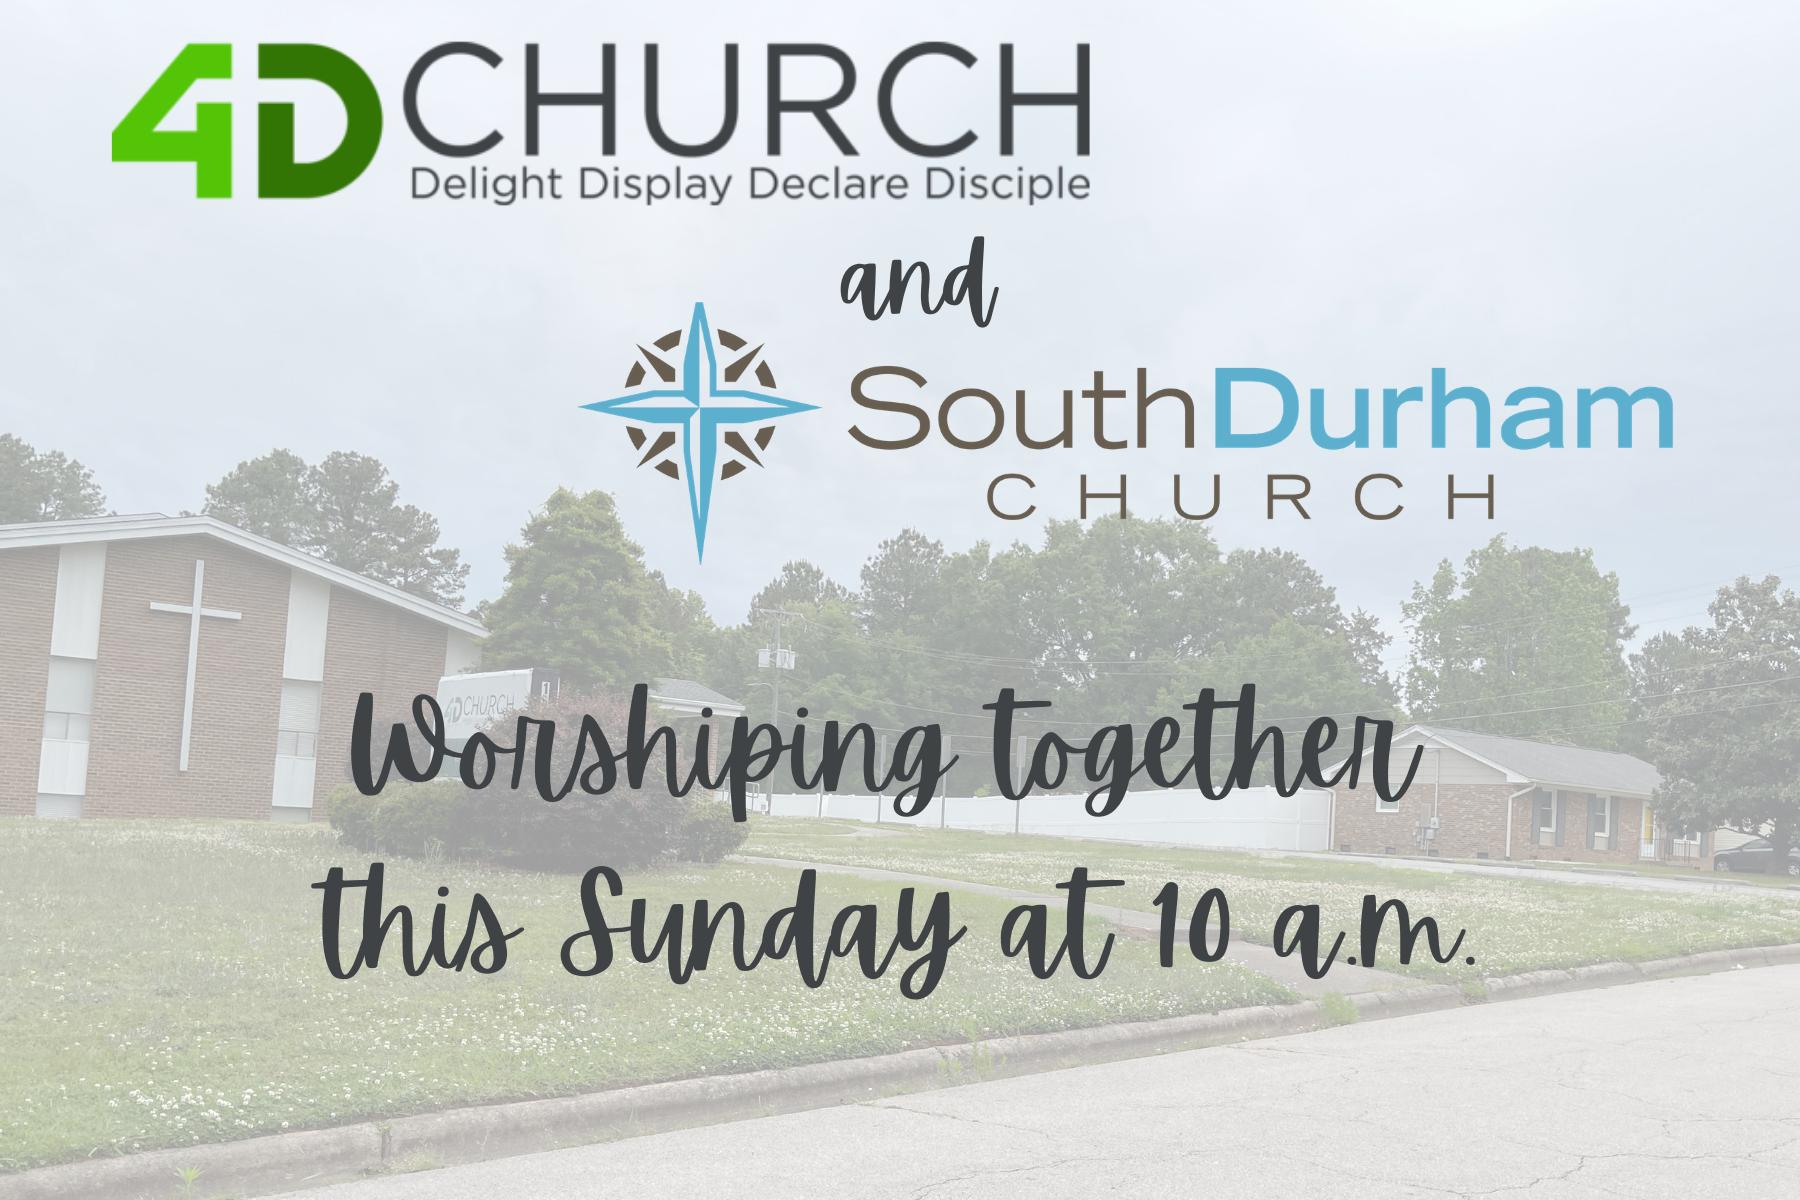 Joint Worship Service 4D n SDC original